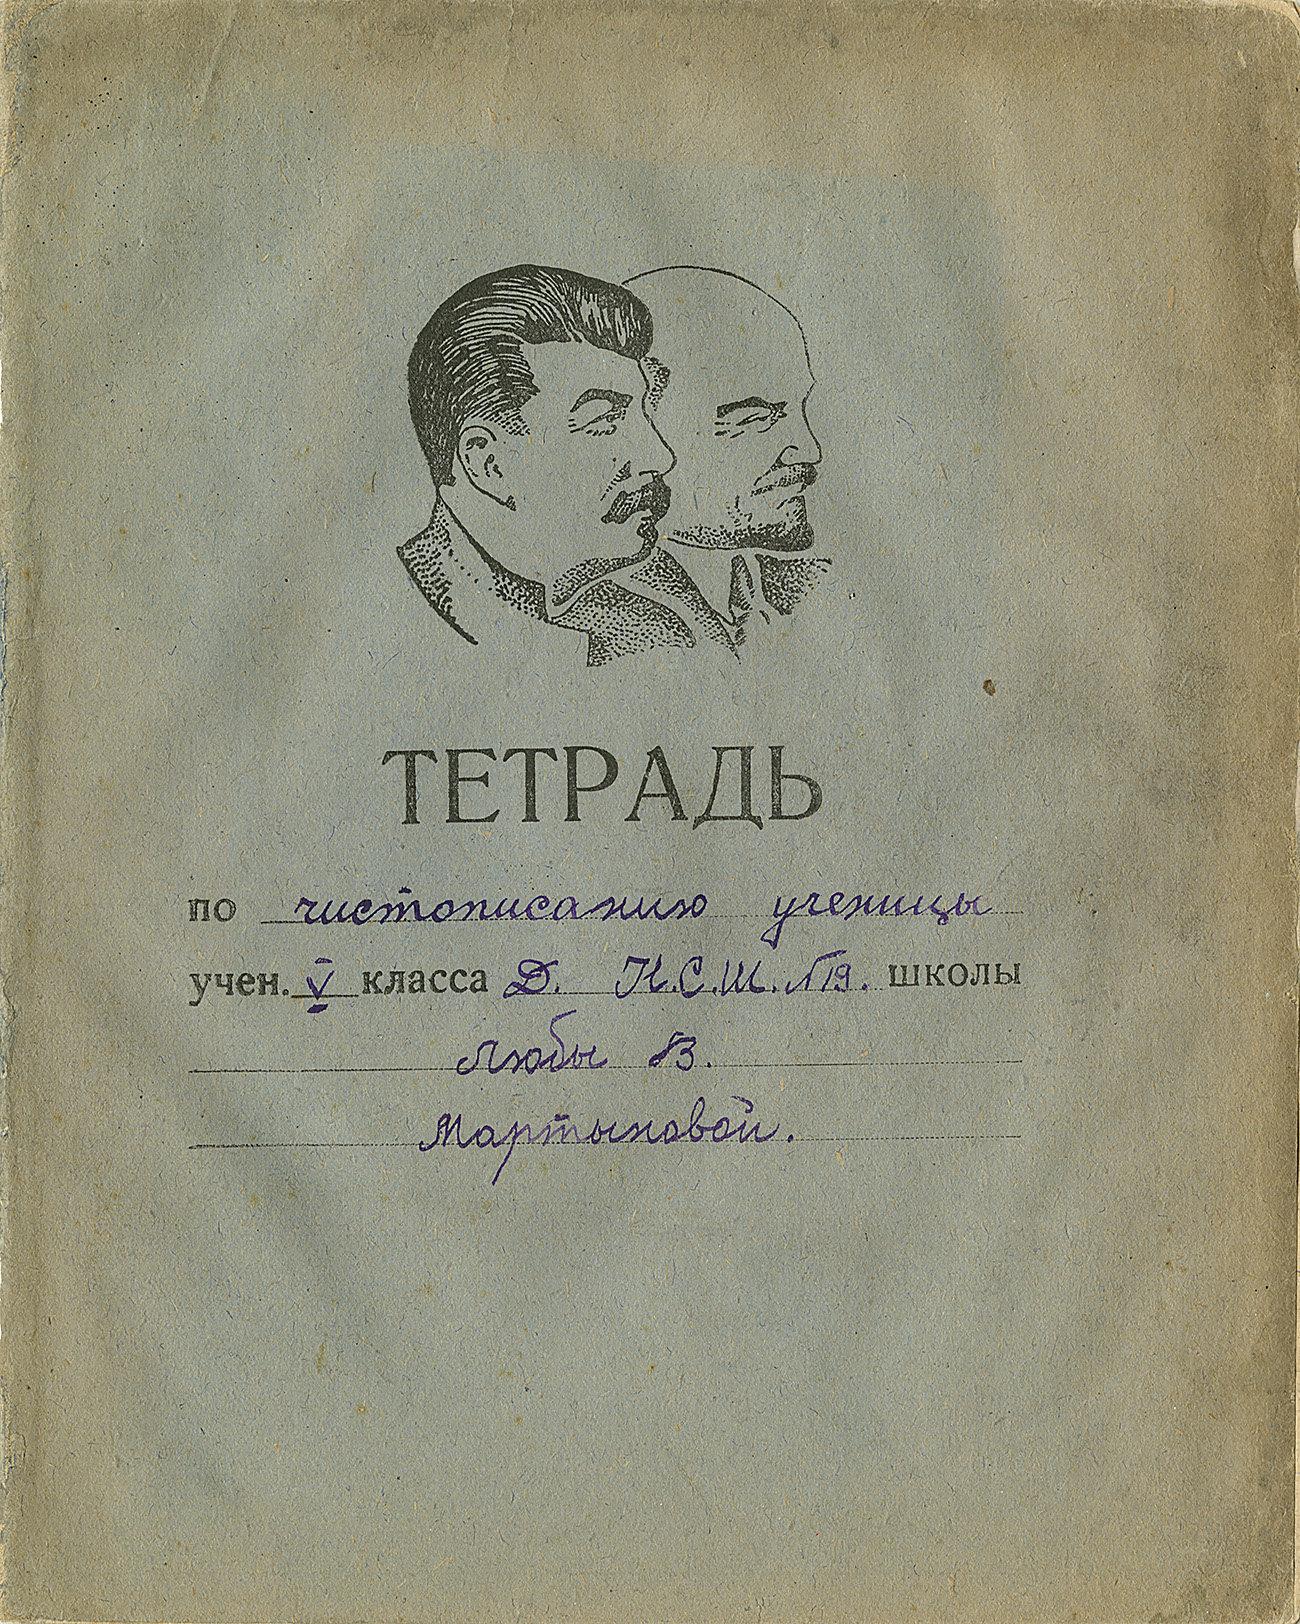 Тетрадь Ленин Сталин